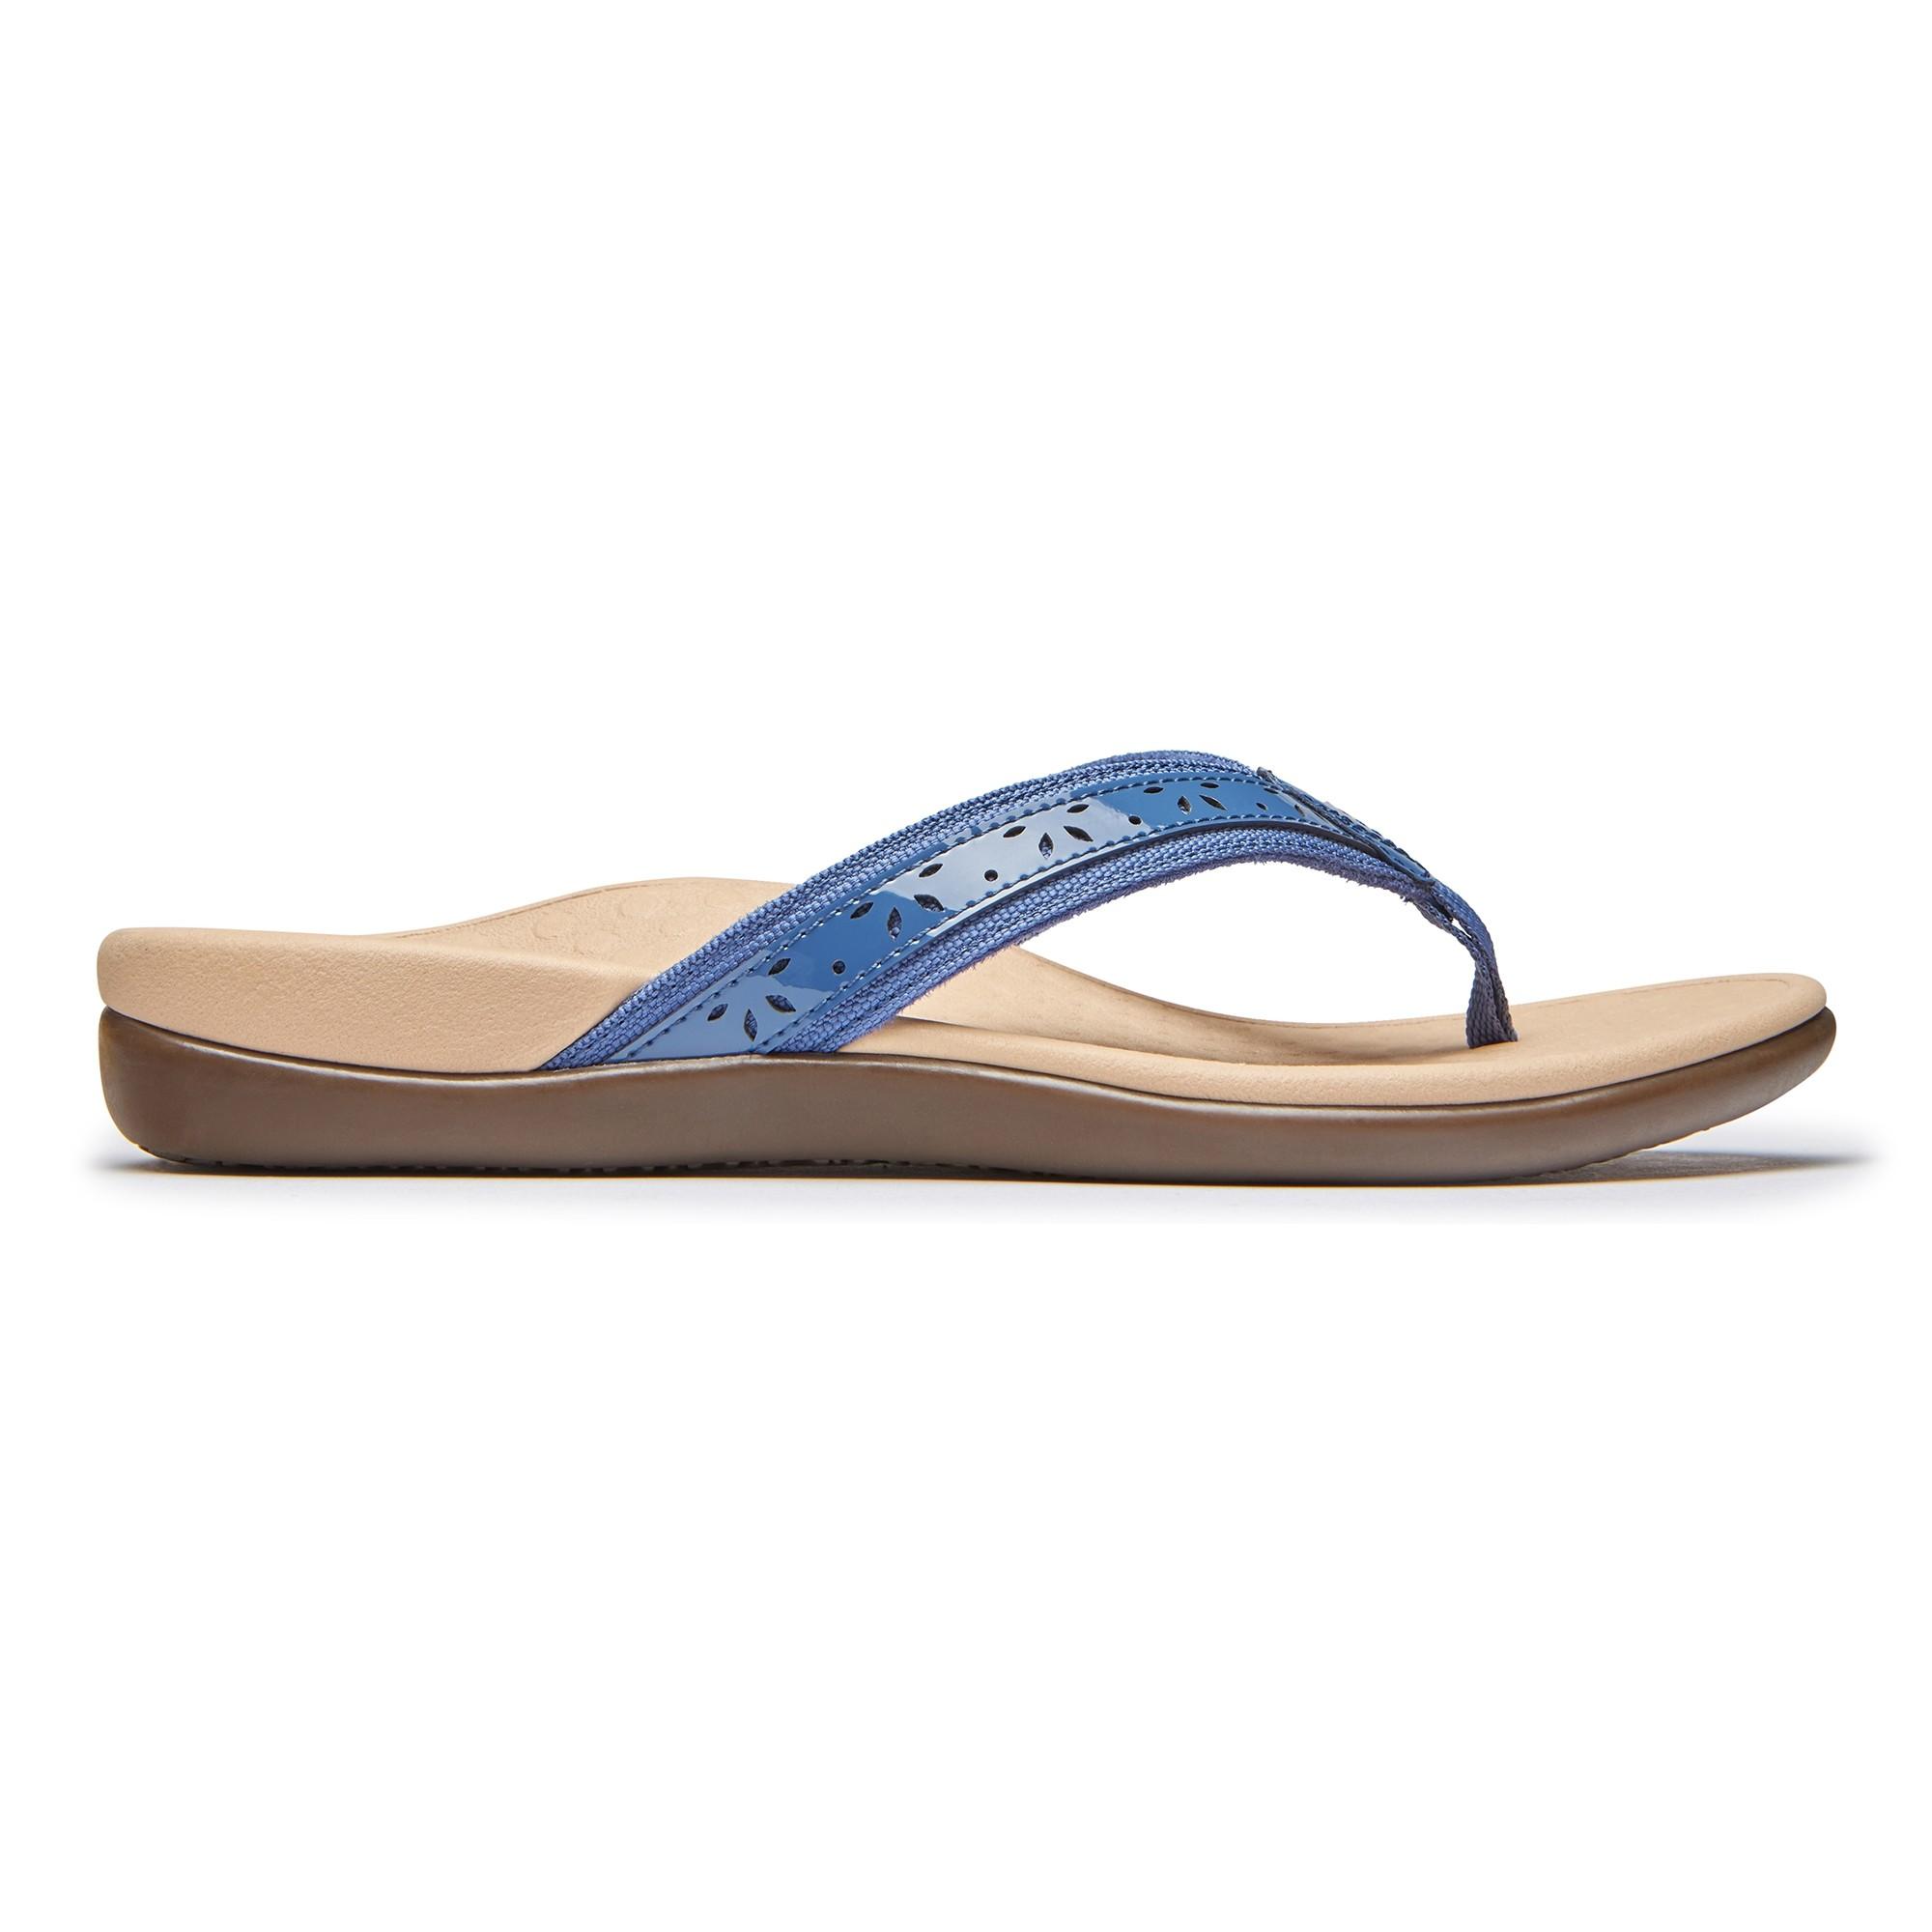 Vionic Tide Casandra Sandals - Women's